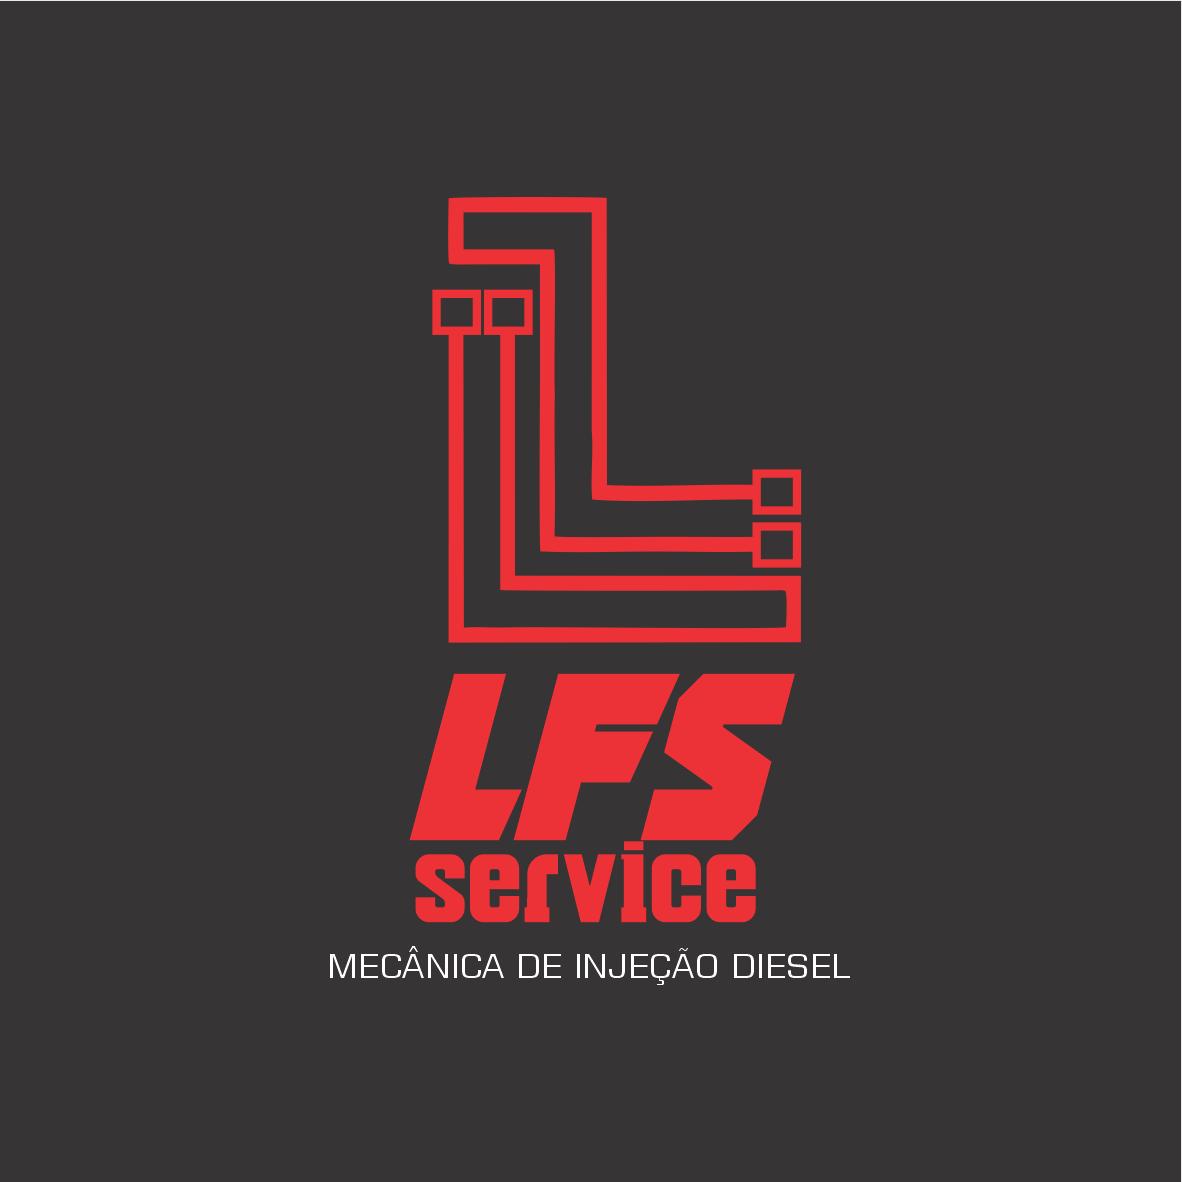 Logotipo Logomarca Mecânica de Injeção a Diesel